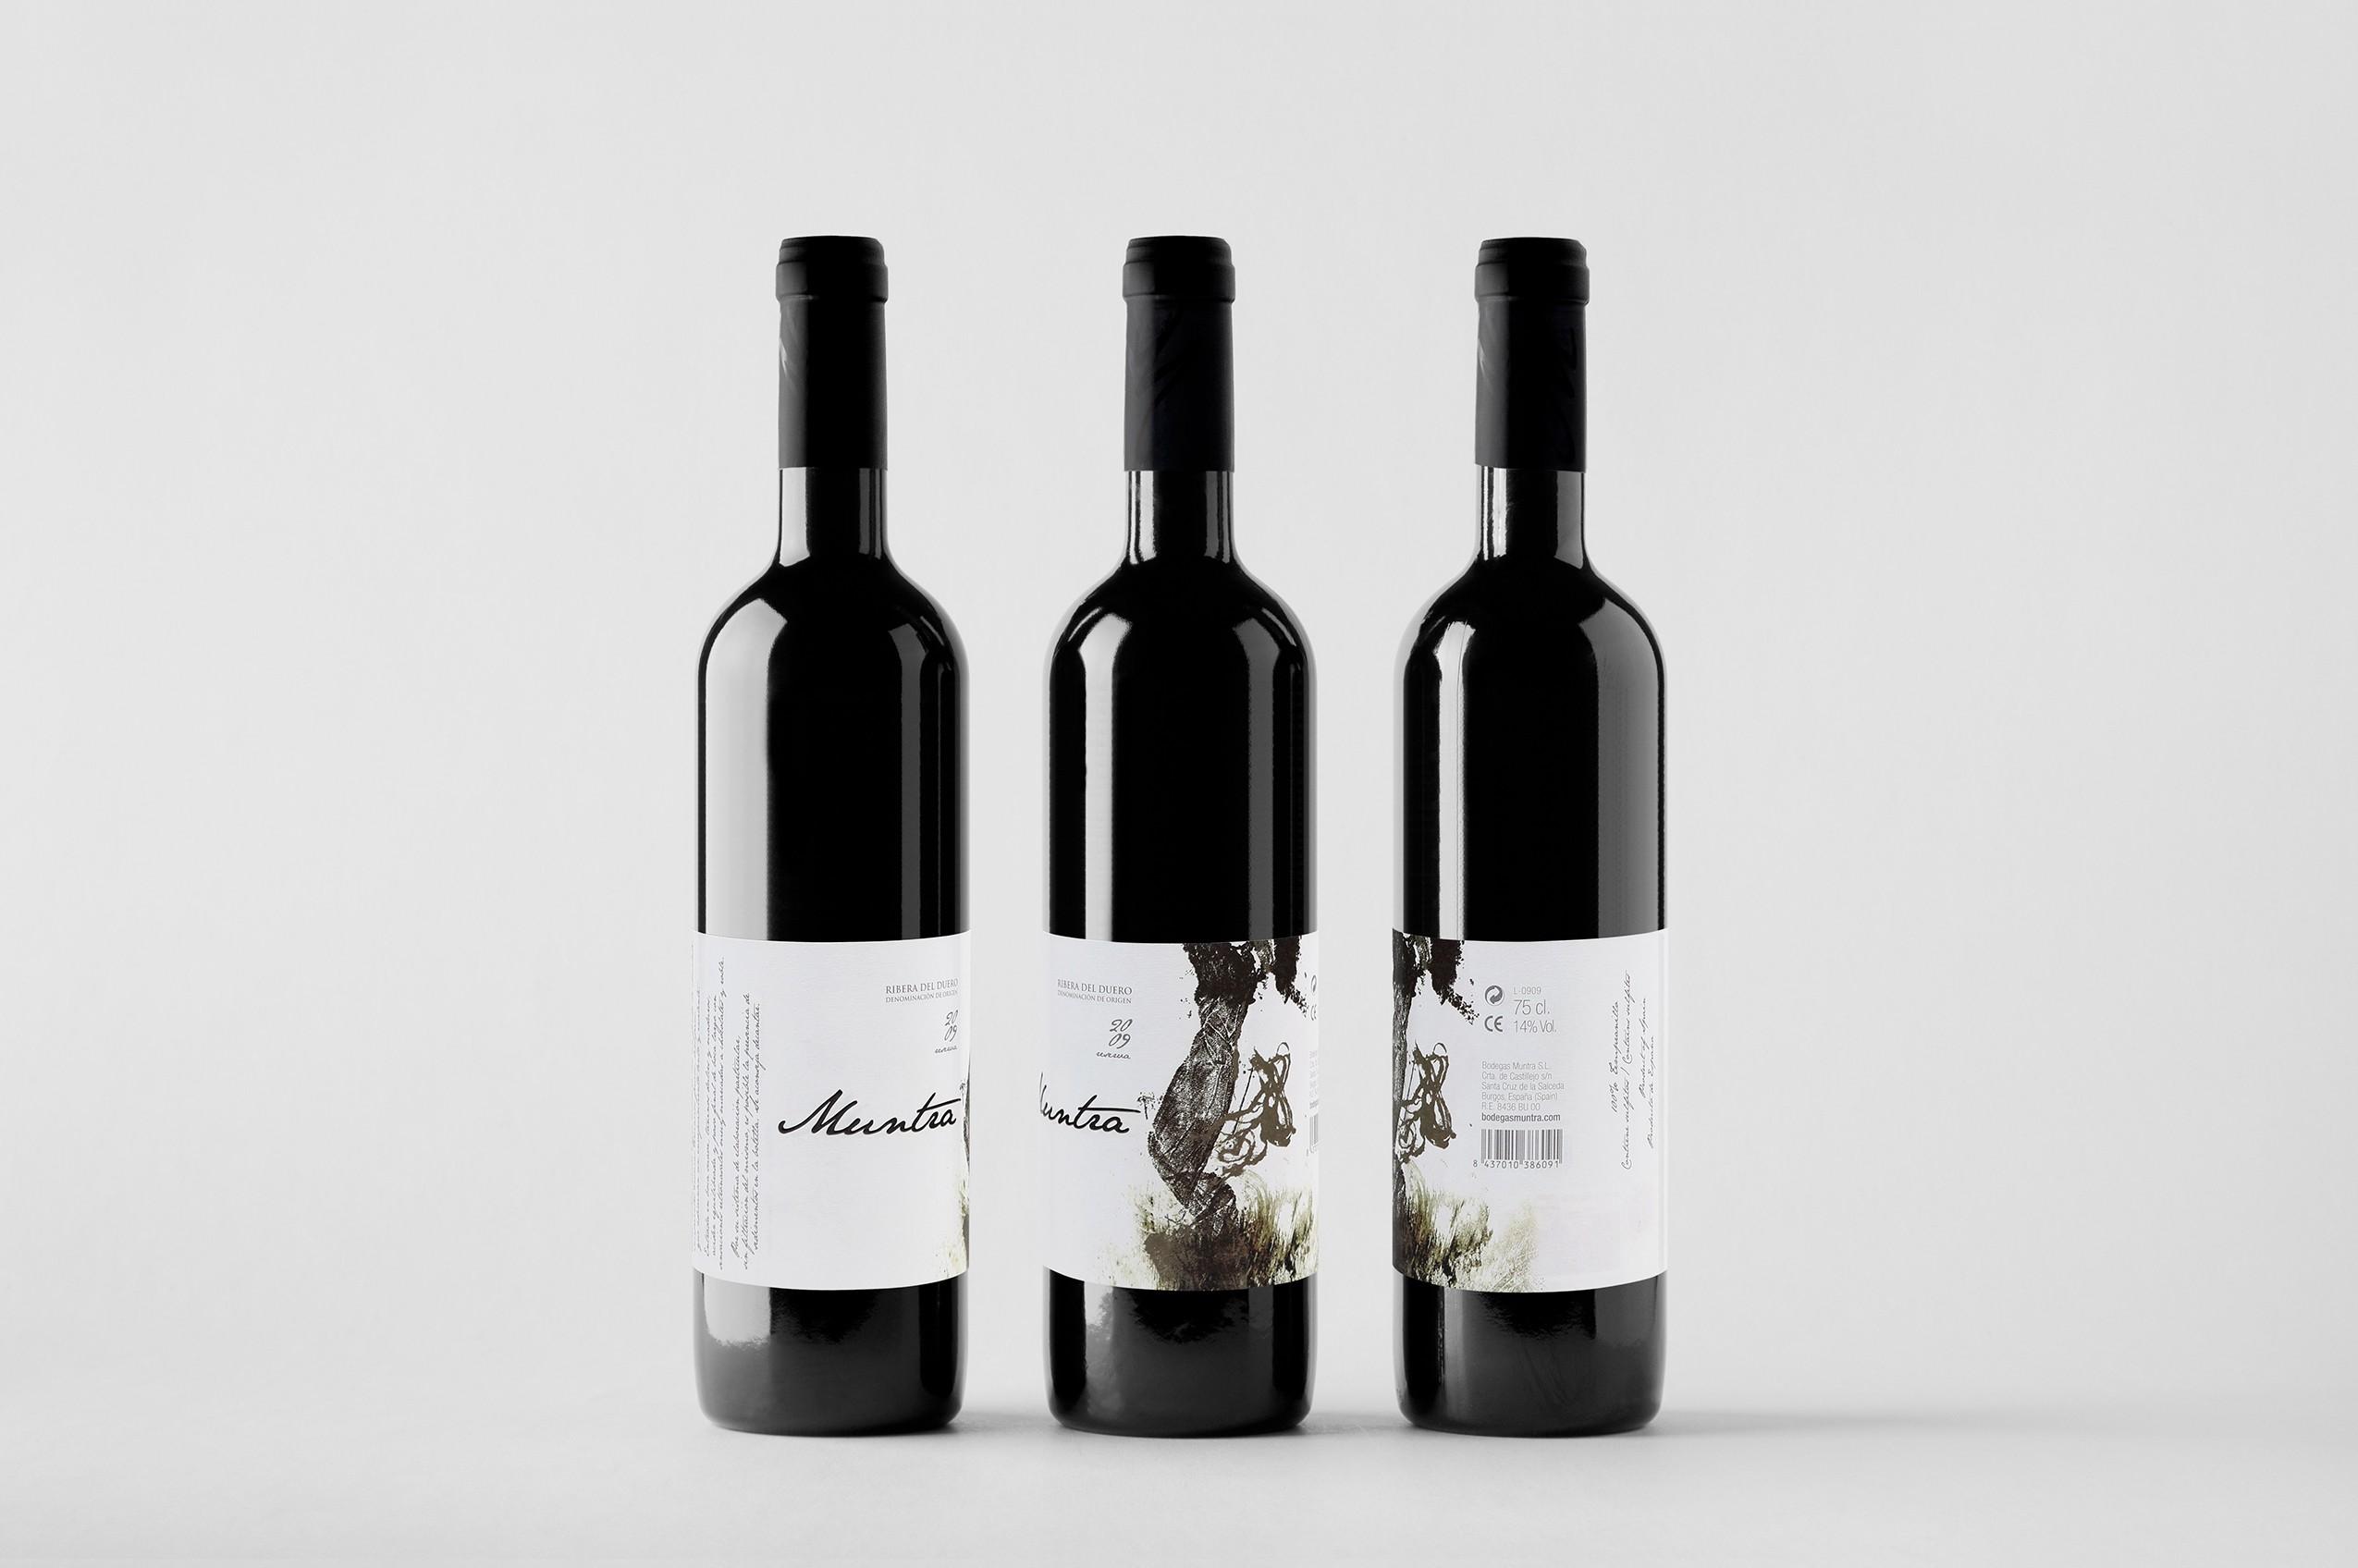 Bodegas Muntra - Diseño etiqueta botellas